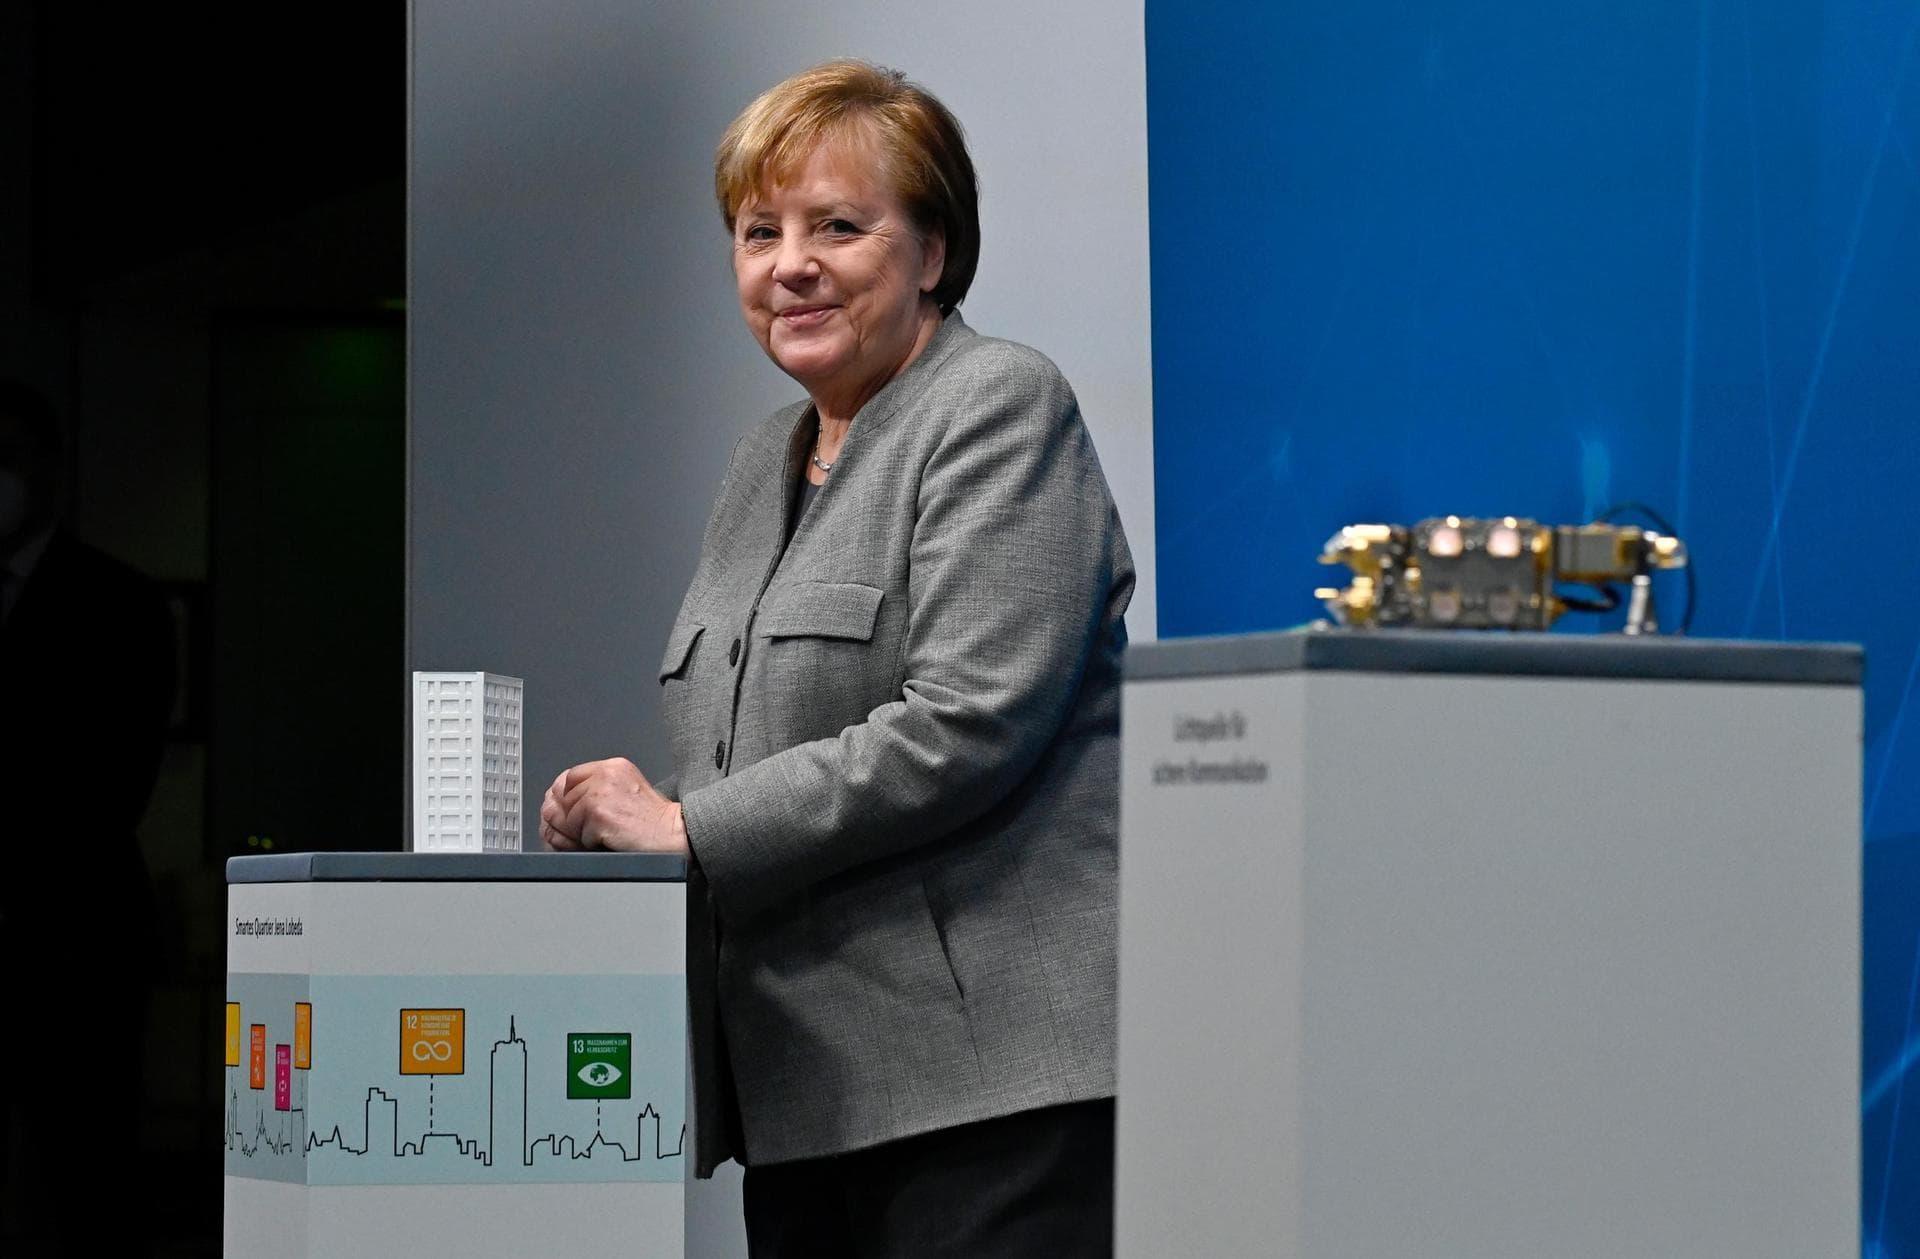 Merkel fordert mehr Tempo beim digitalen Wandel Online-Digitalgipfel